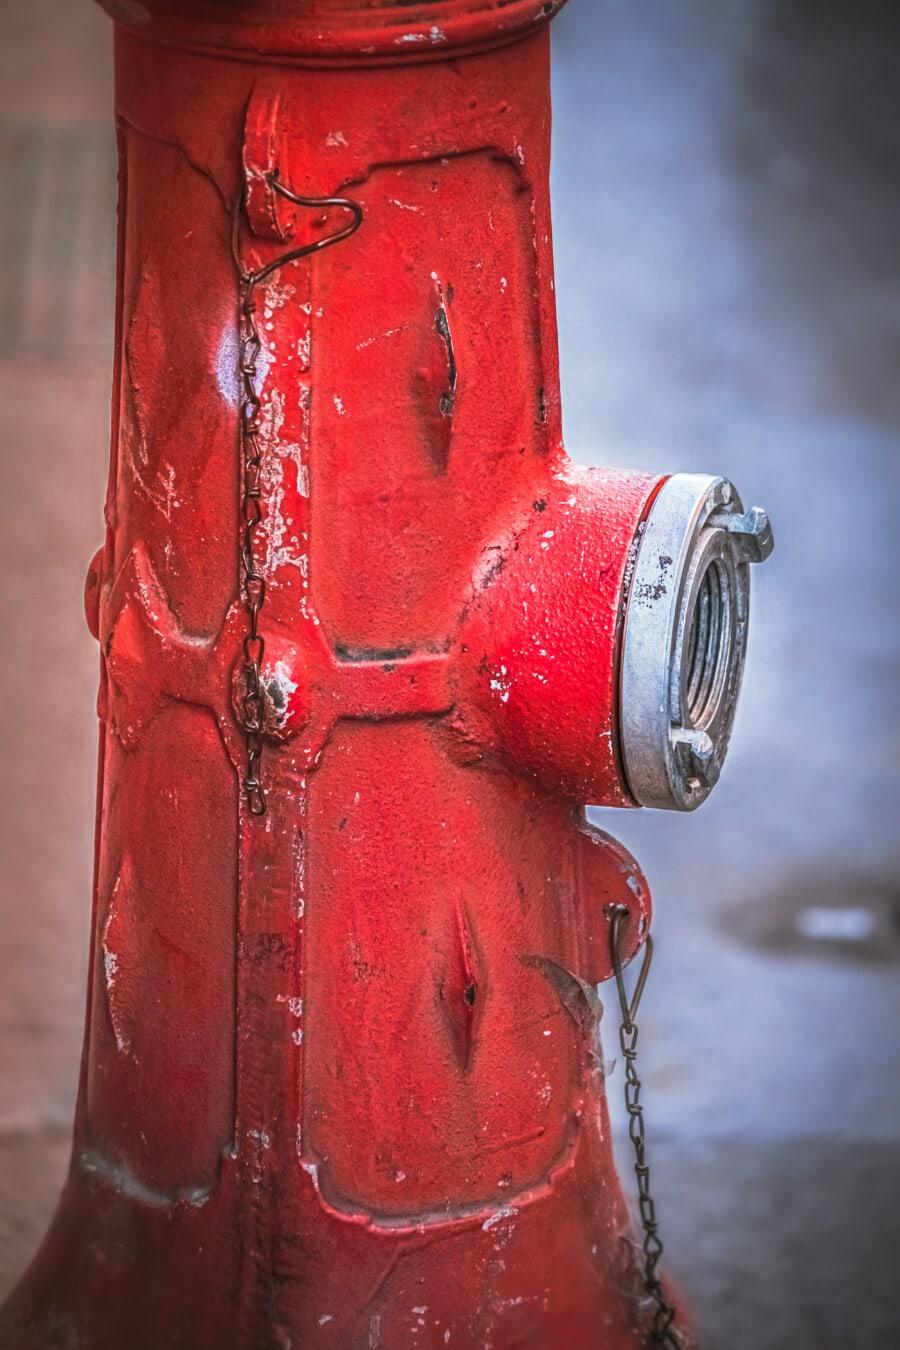 hidrant, din fonta, roşu, vopsea, pompa, vechi, retro, Vintage, robinet, Antique